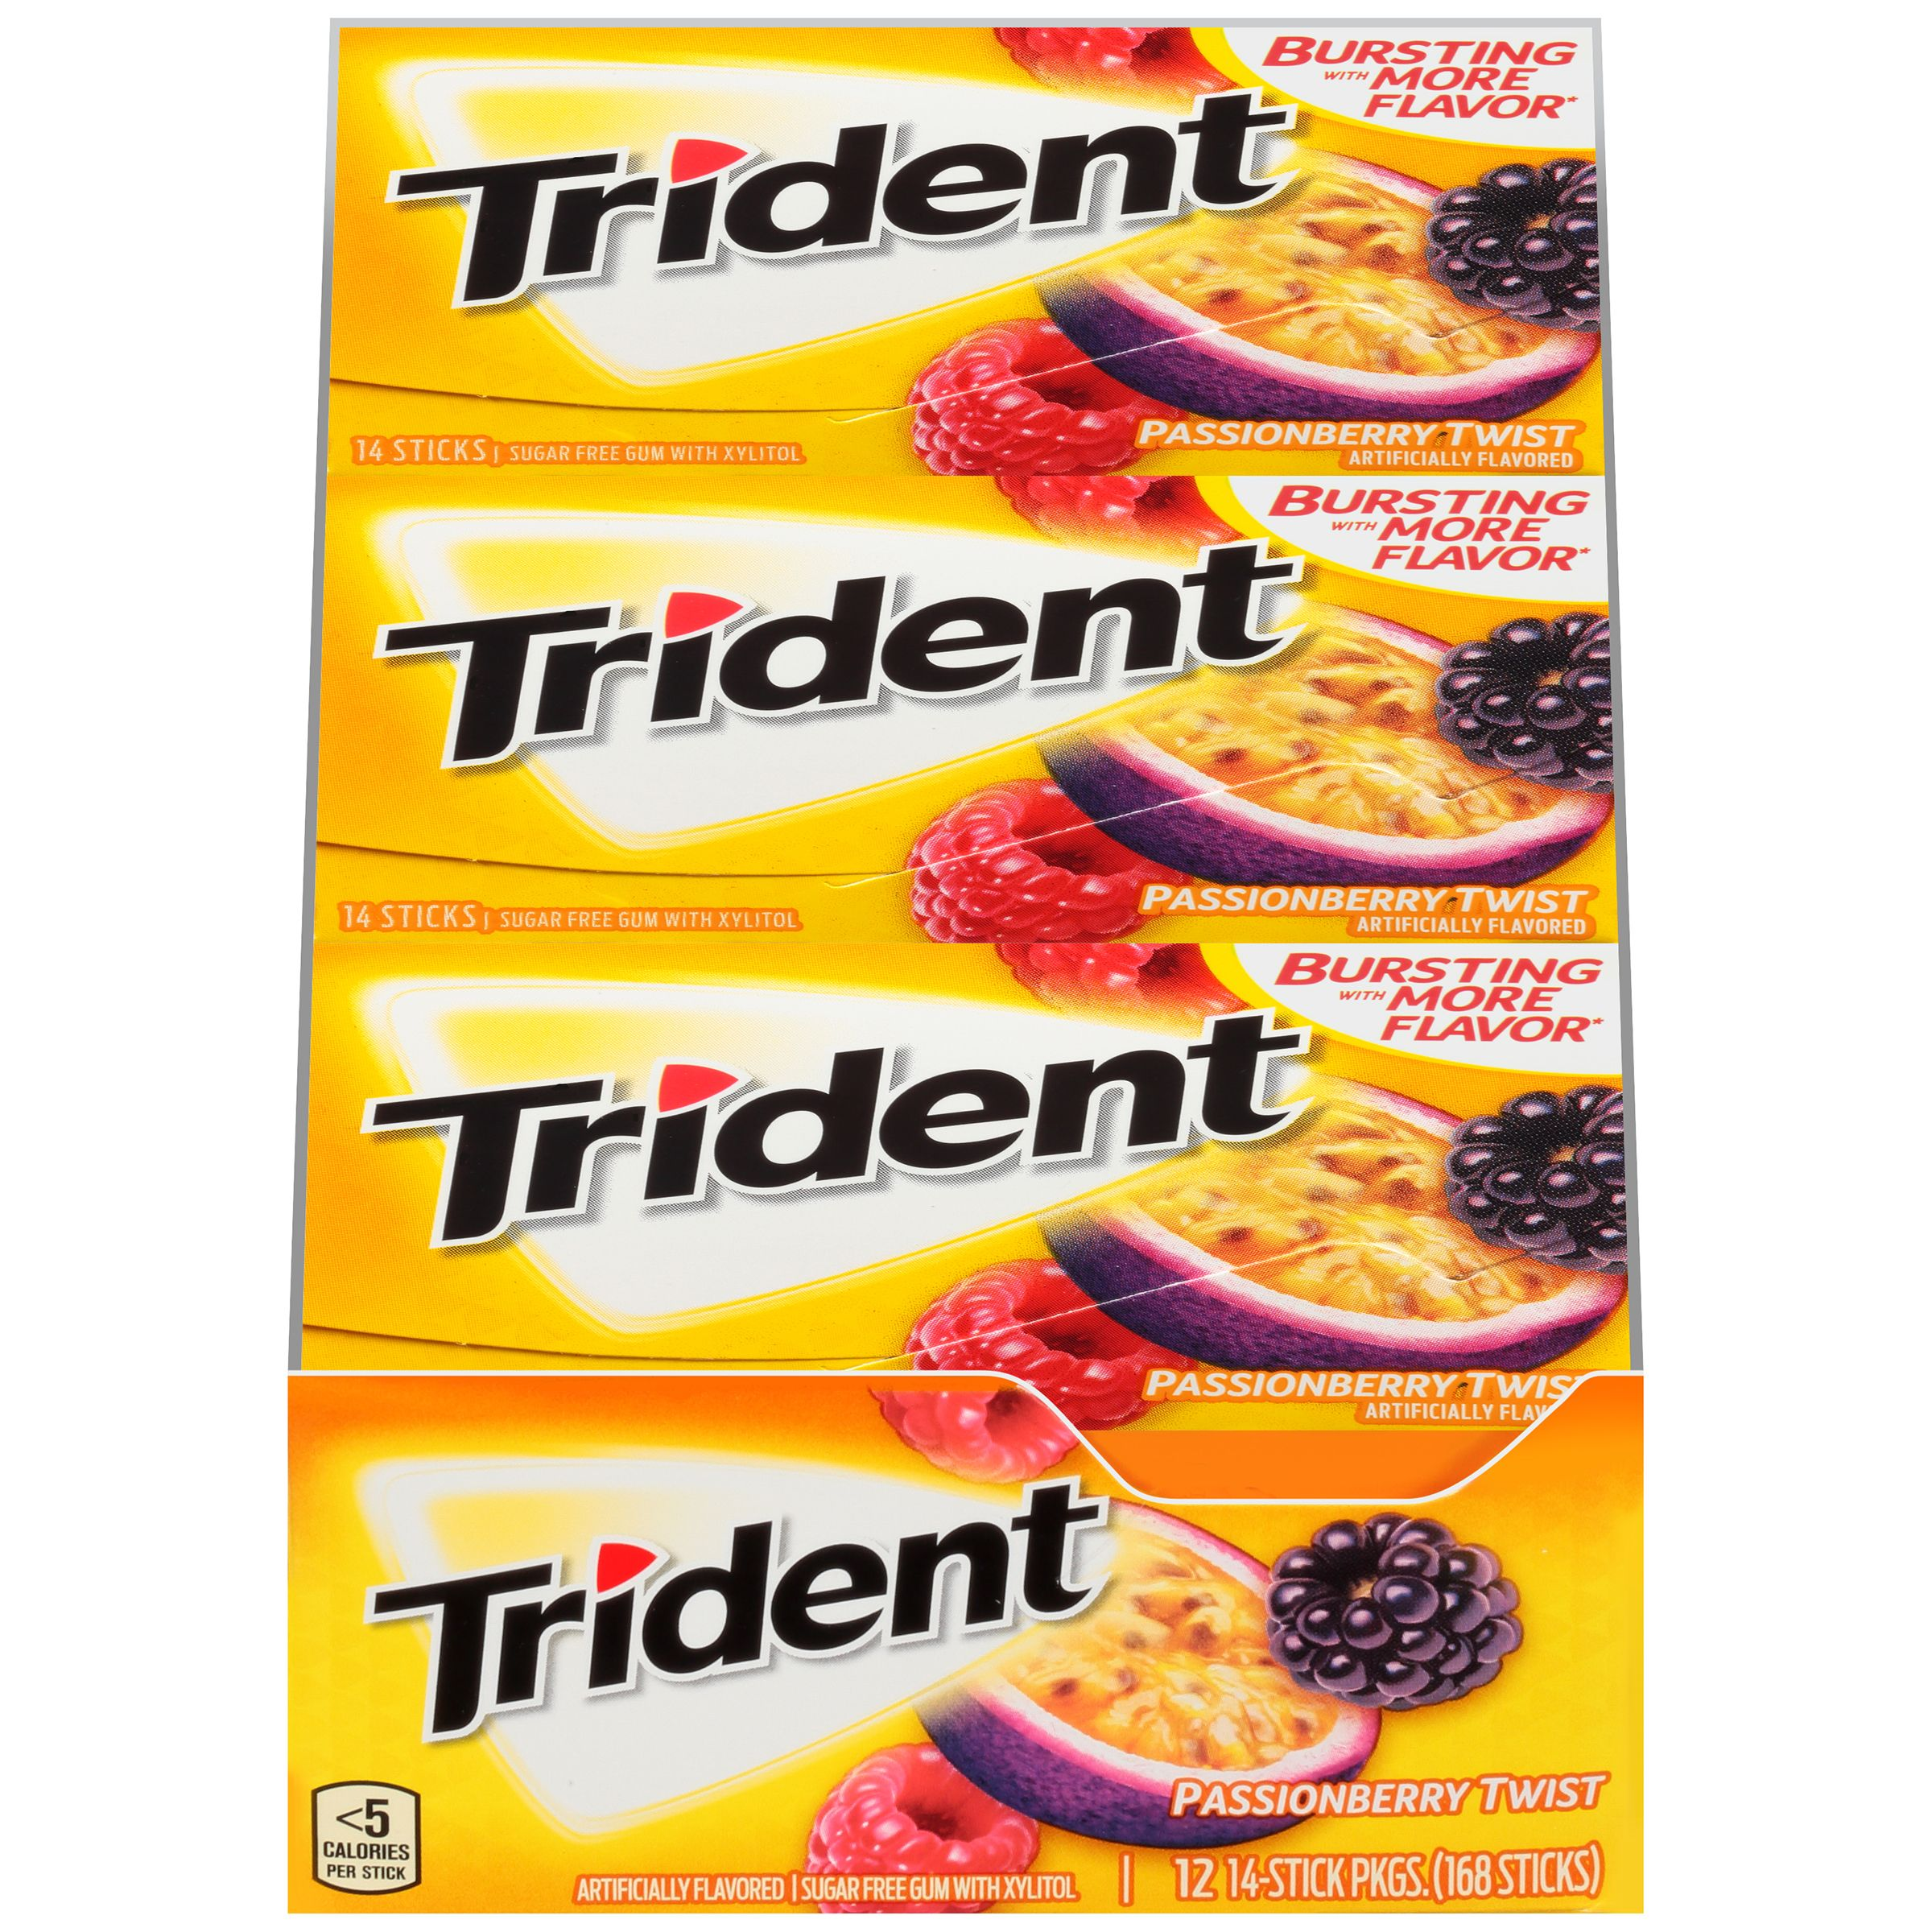 Trident, Sugar Free Passionberry Twist Chewing Gum, 14 Pcs, 12 Ct